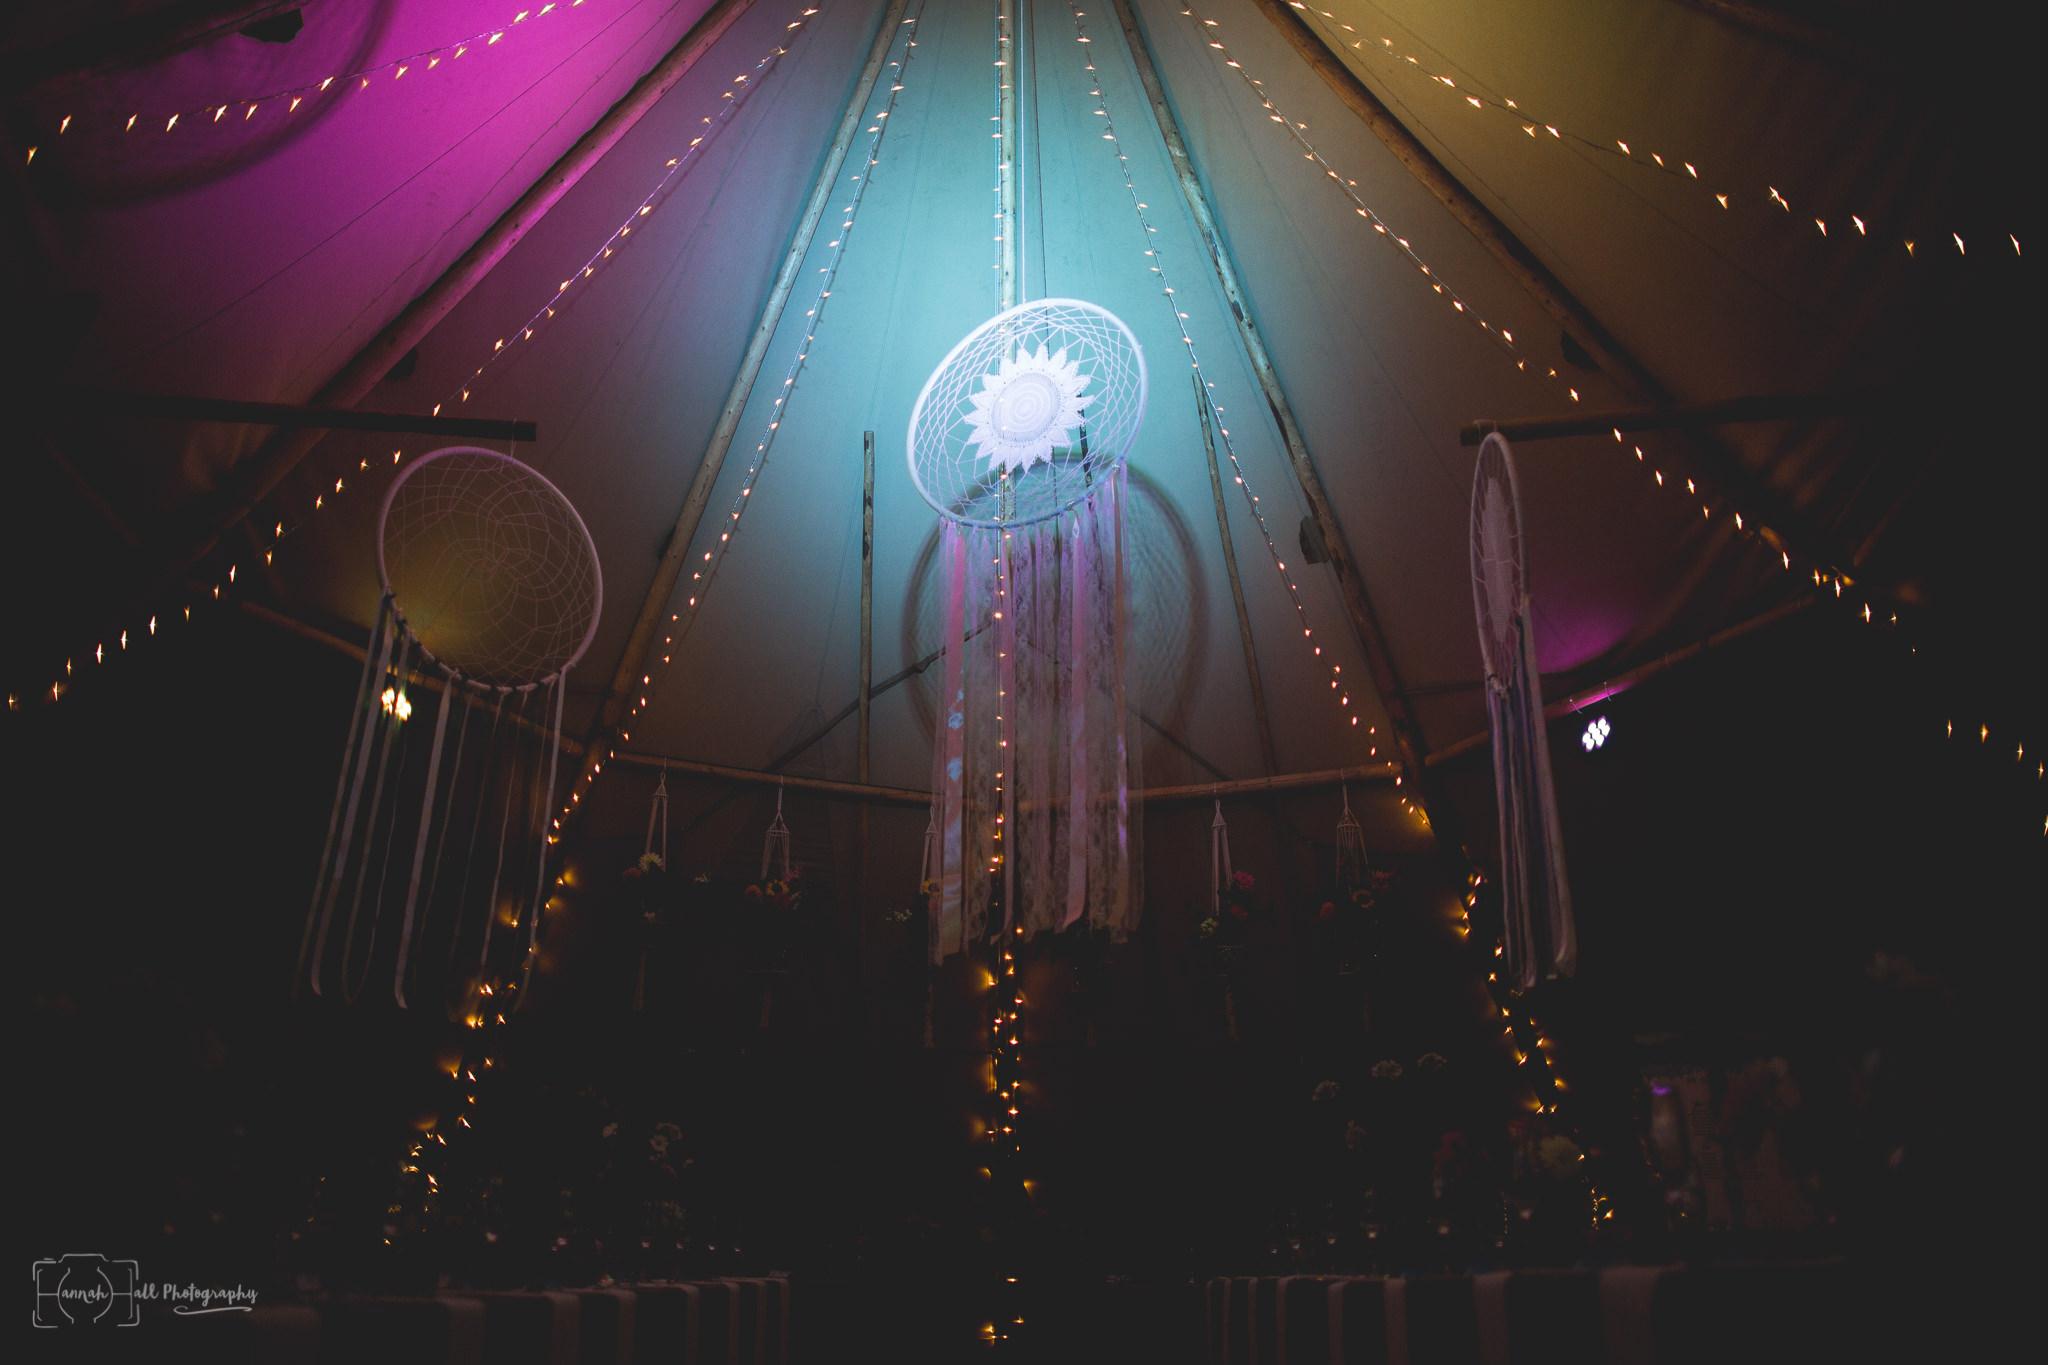 hhp_derbyshire_wedding_photographer-1